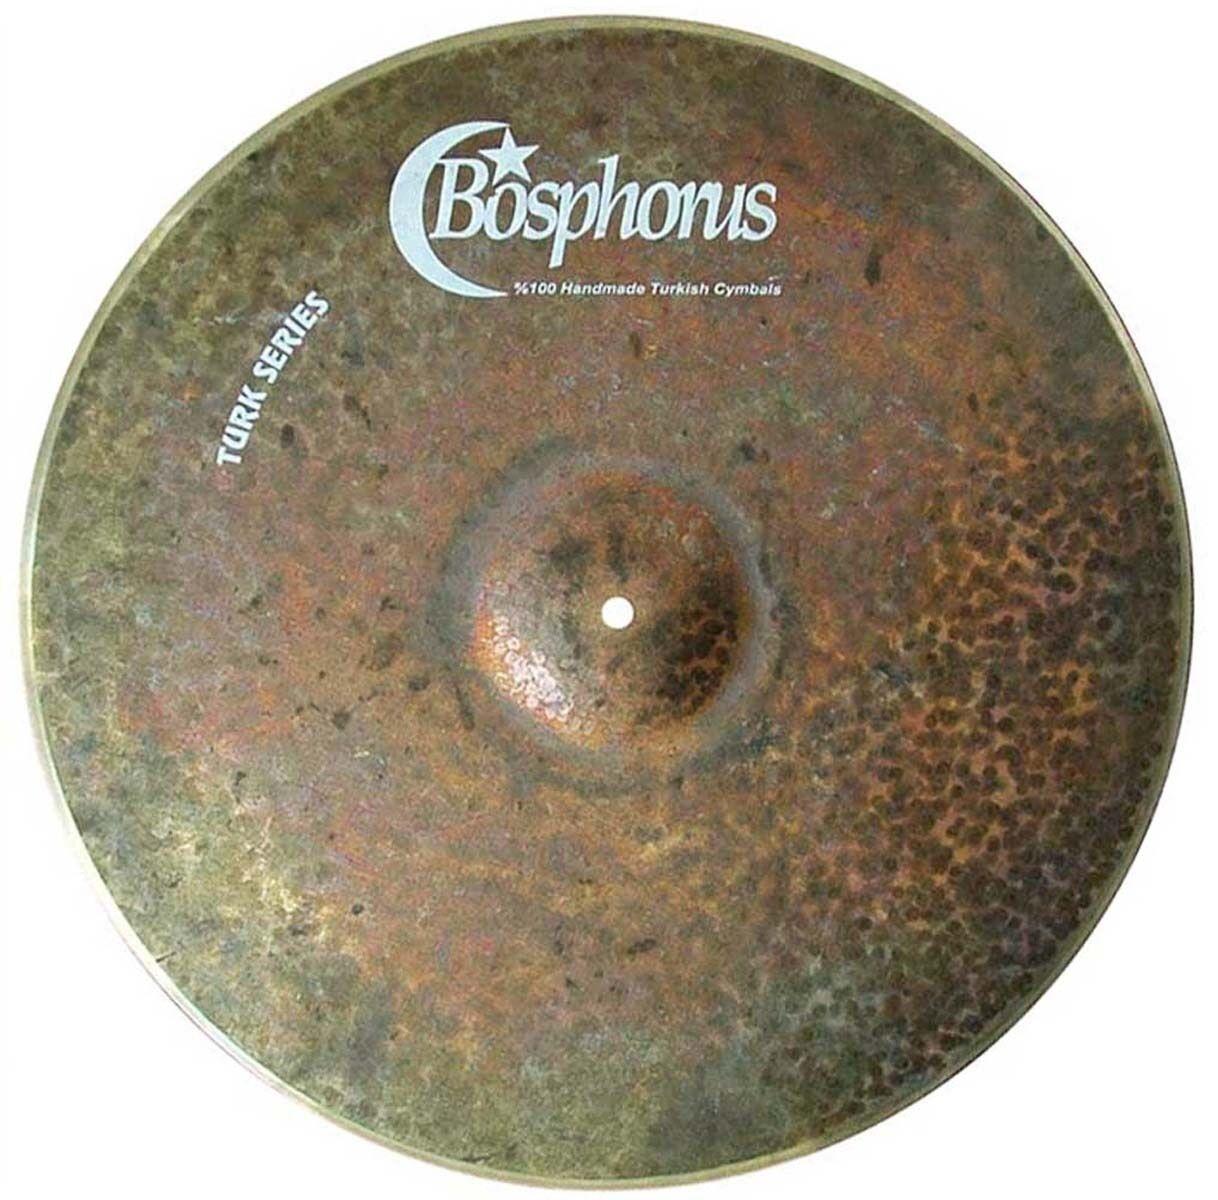 BOSPHORUS Turk Serie Crash 15